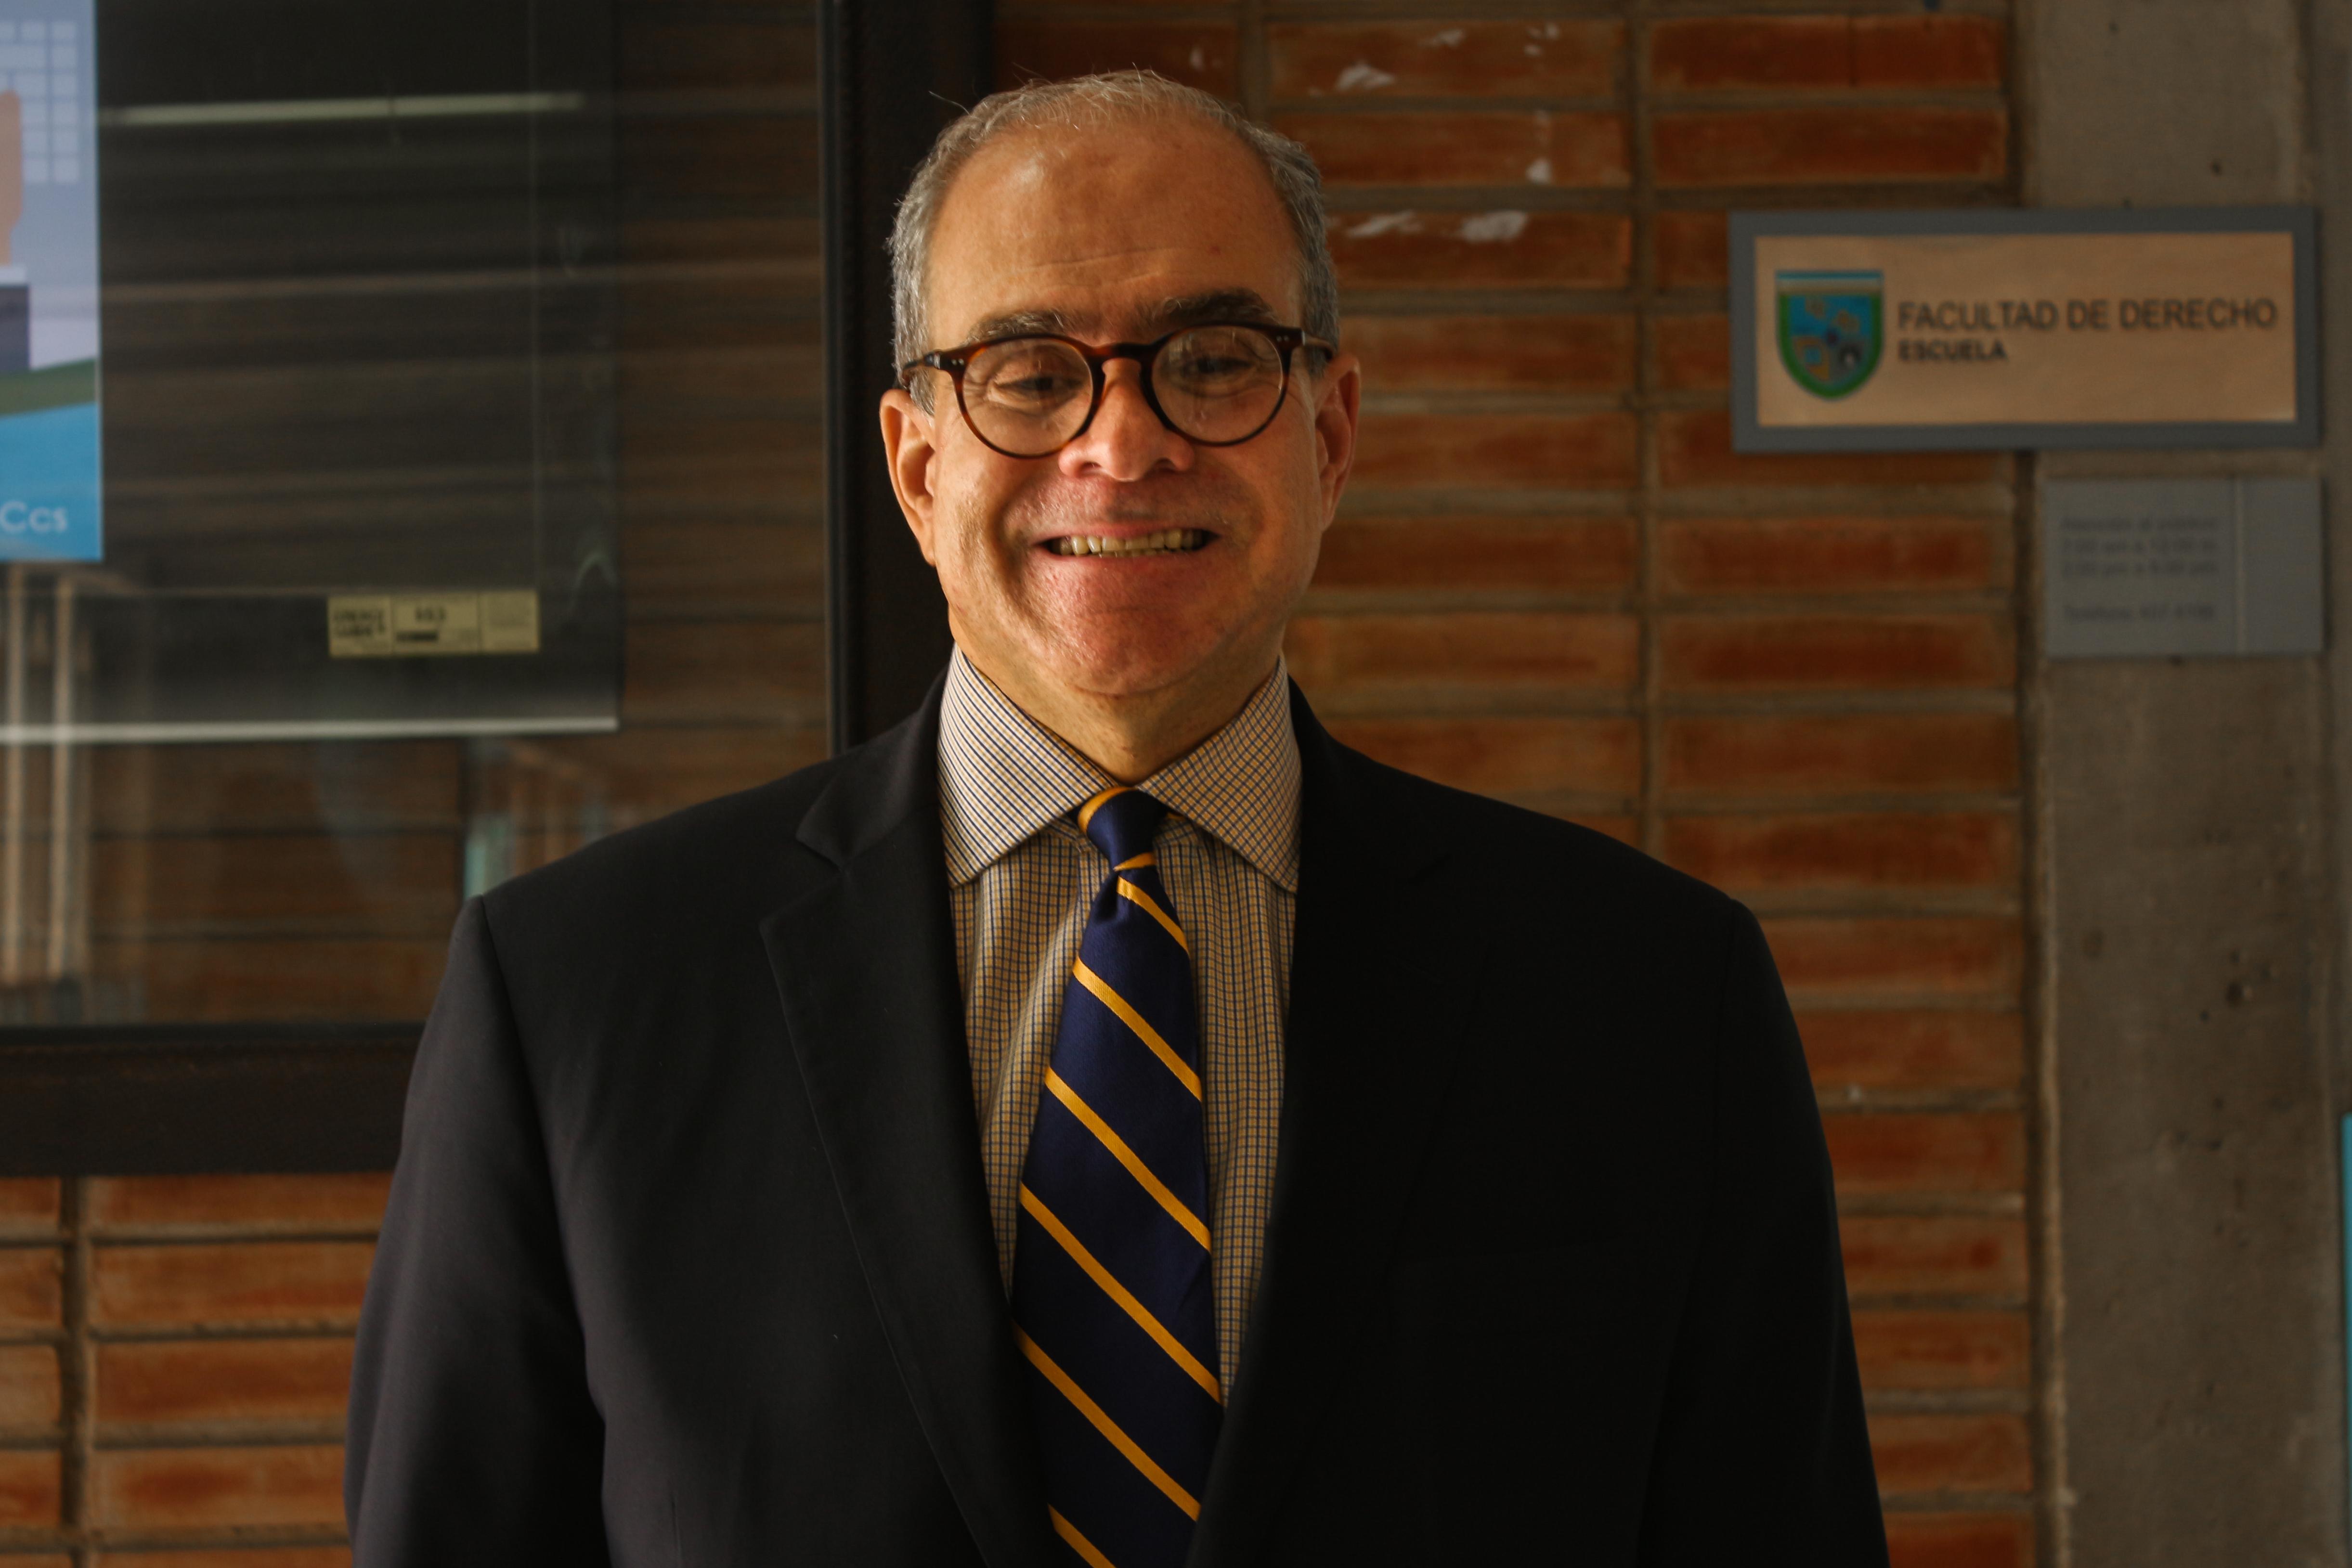 Profesores que inspiran: Pedro Planchart